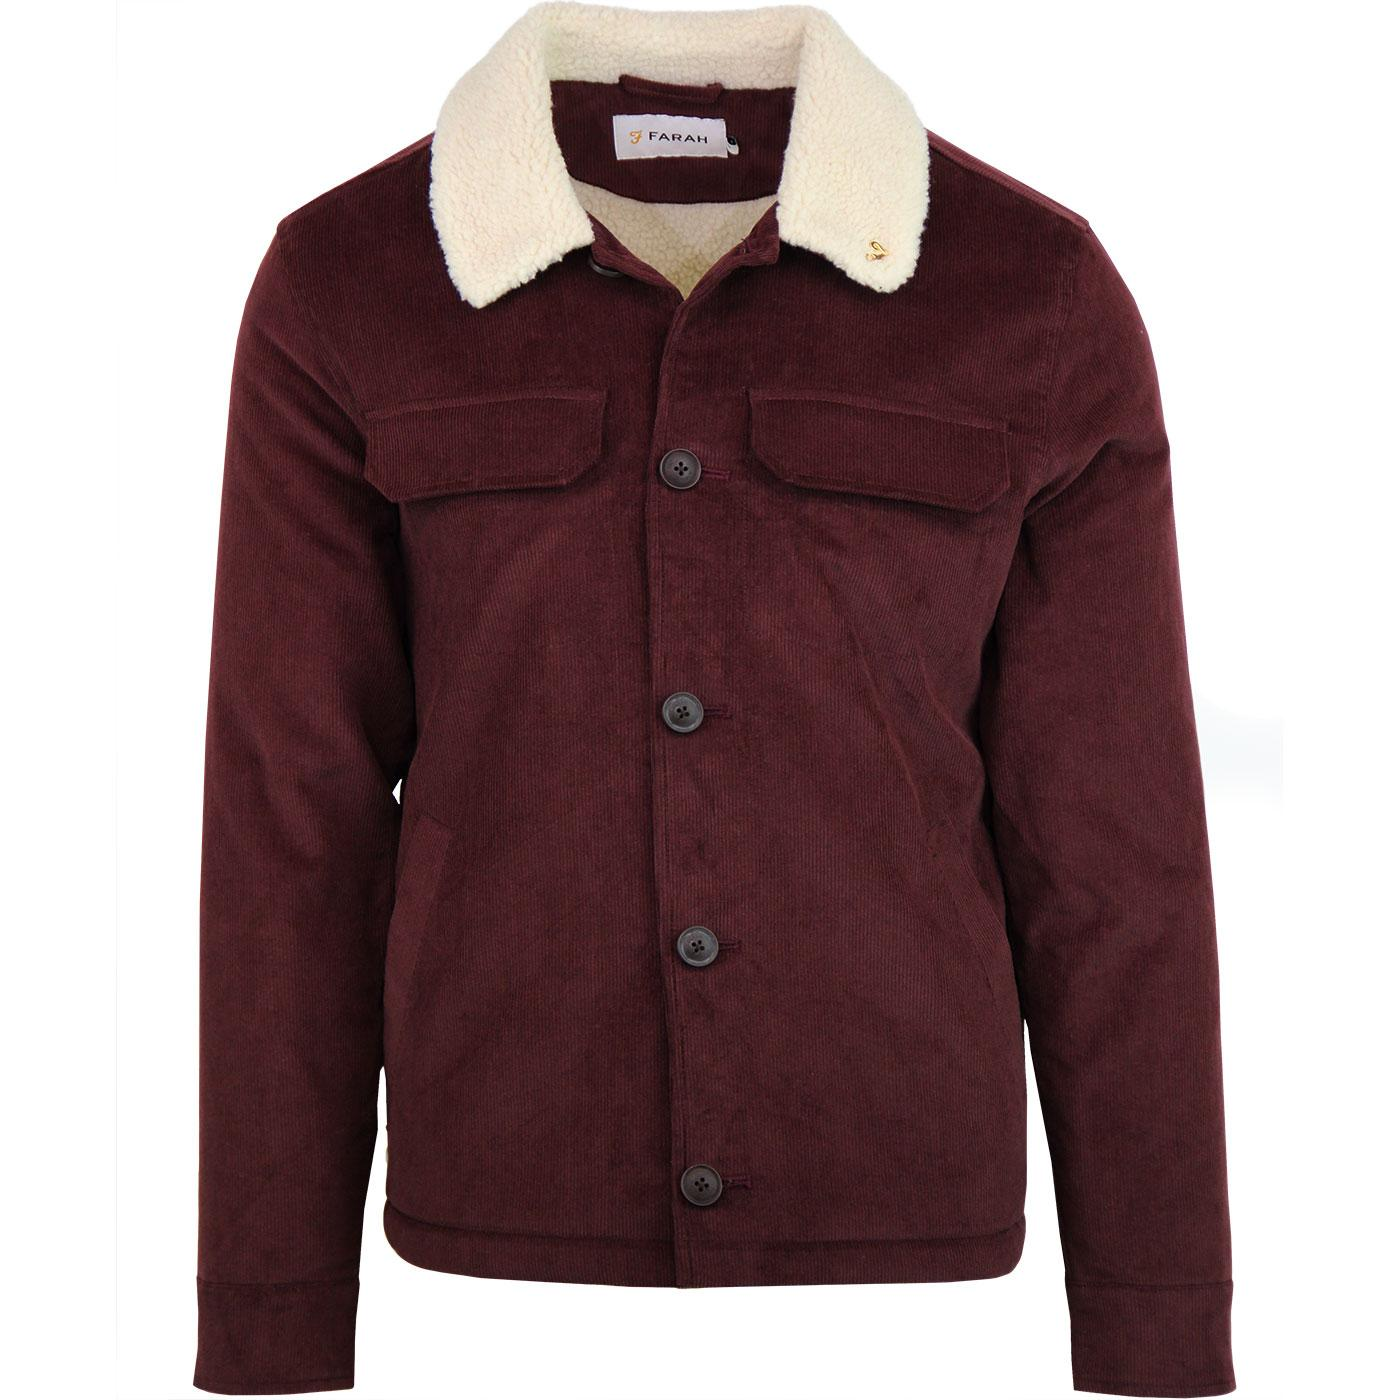 Kingsland FARAH Retro Cord Sherpa Jacket  - Red